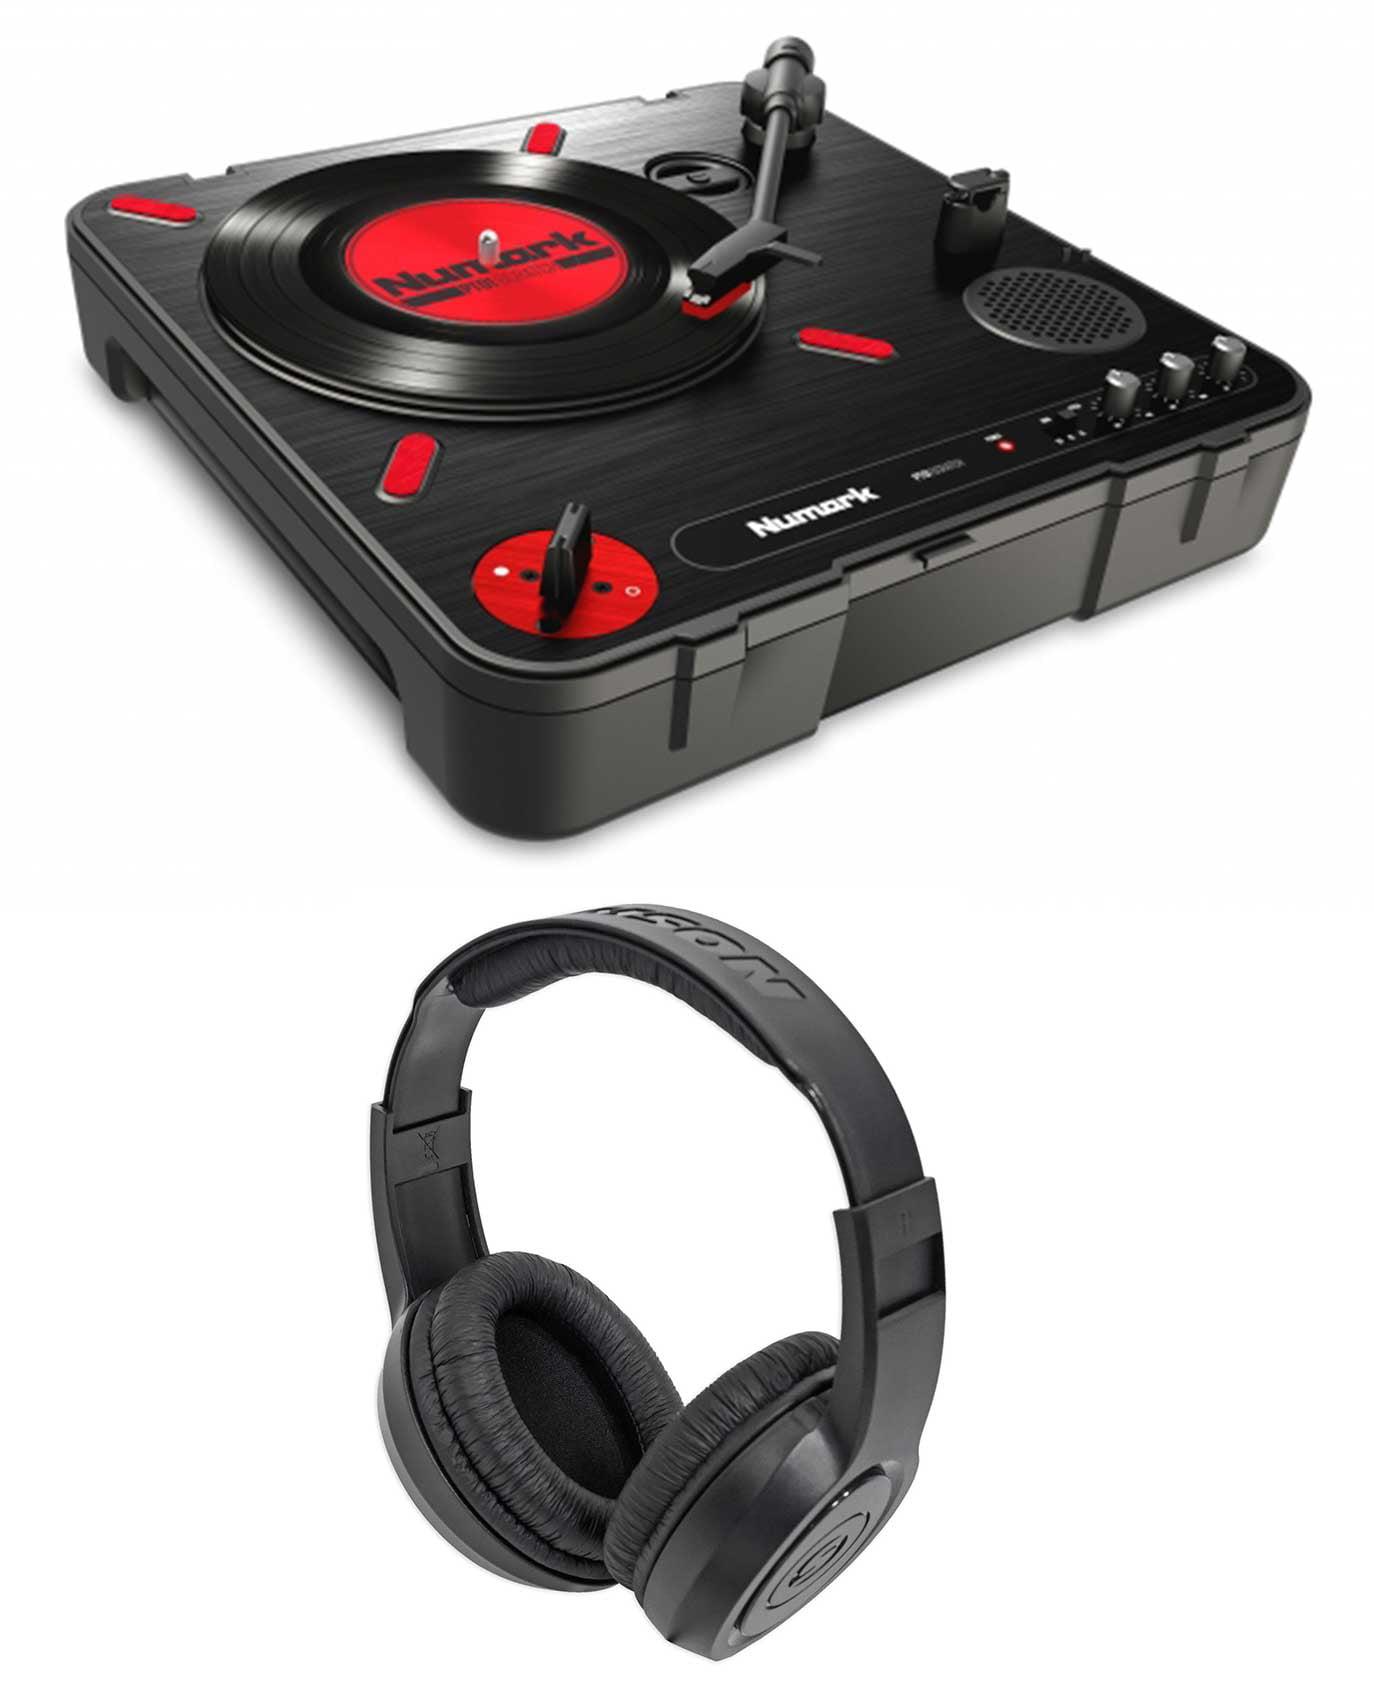 Numark PT01 Scratch DJ Turntable w/ USB/AUX/RCA+Speaker+Samson Headphones